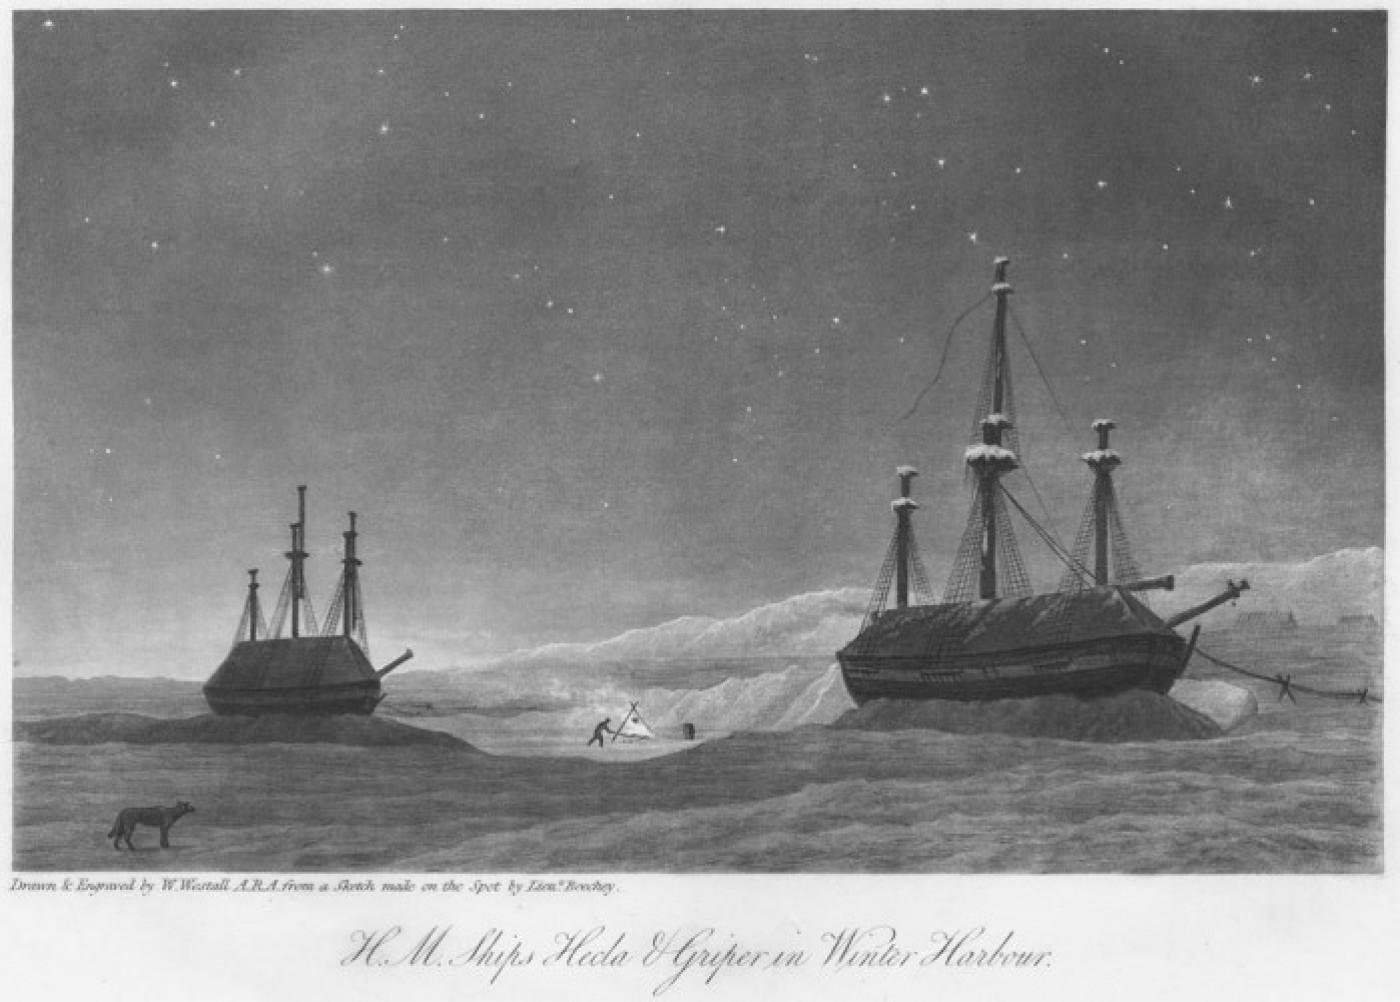 H M Ships Hecla & Griper in Winter Harbour